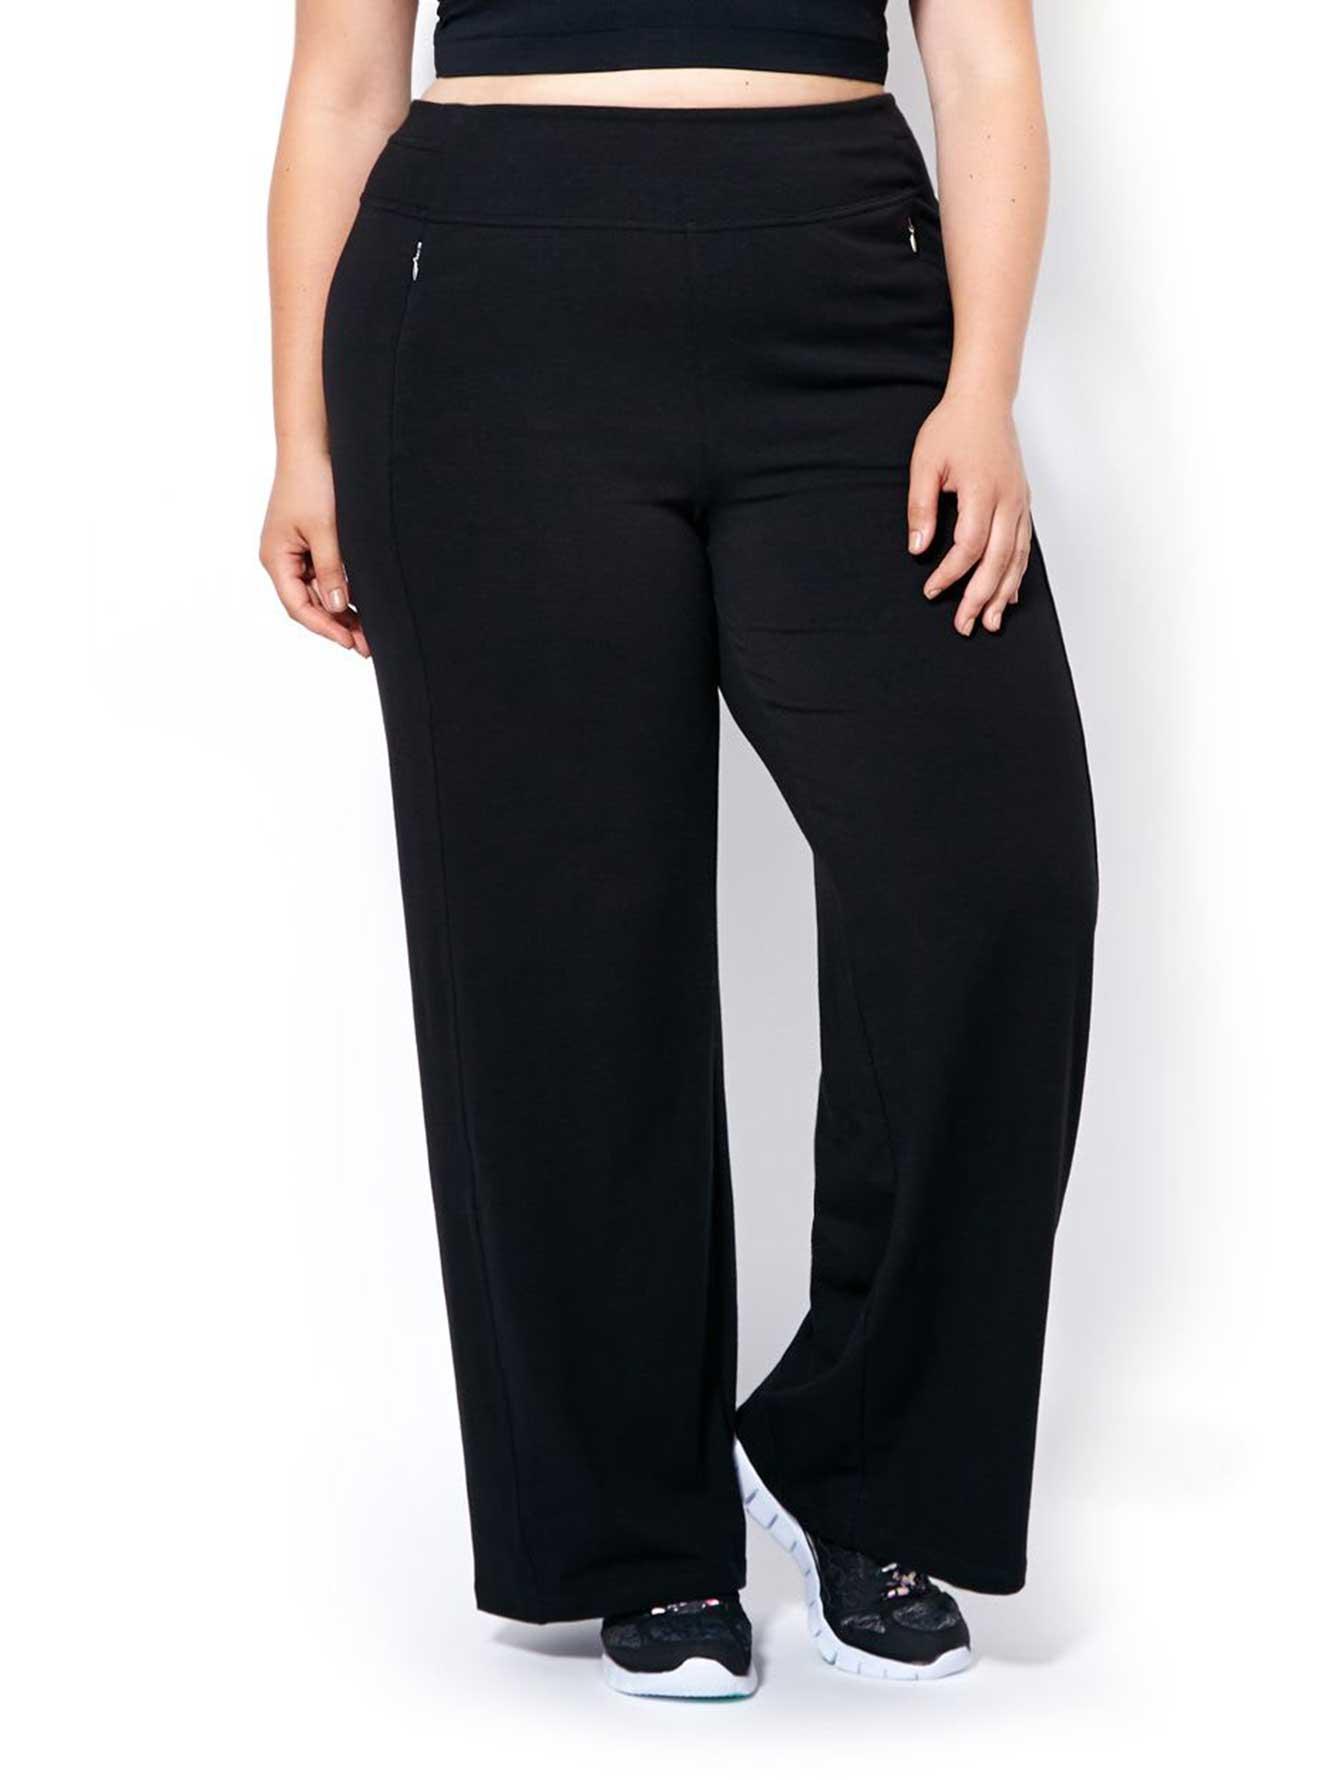 0c5e02adb55704 Essentials - Plus-Size Wide Leg Yoga Pant | Penningtons